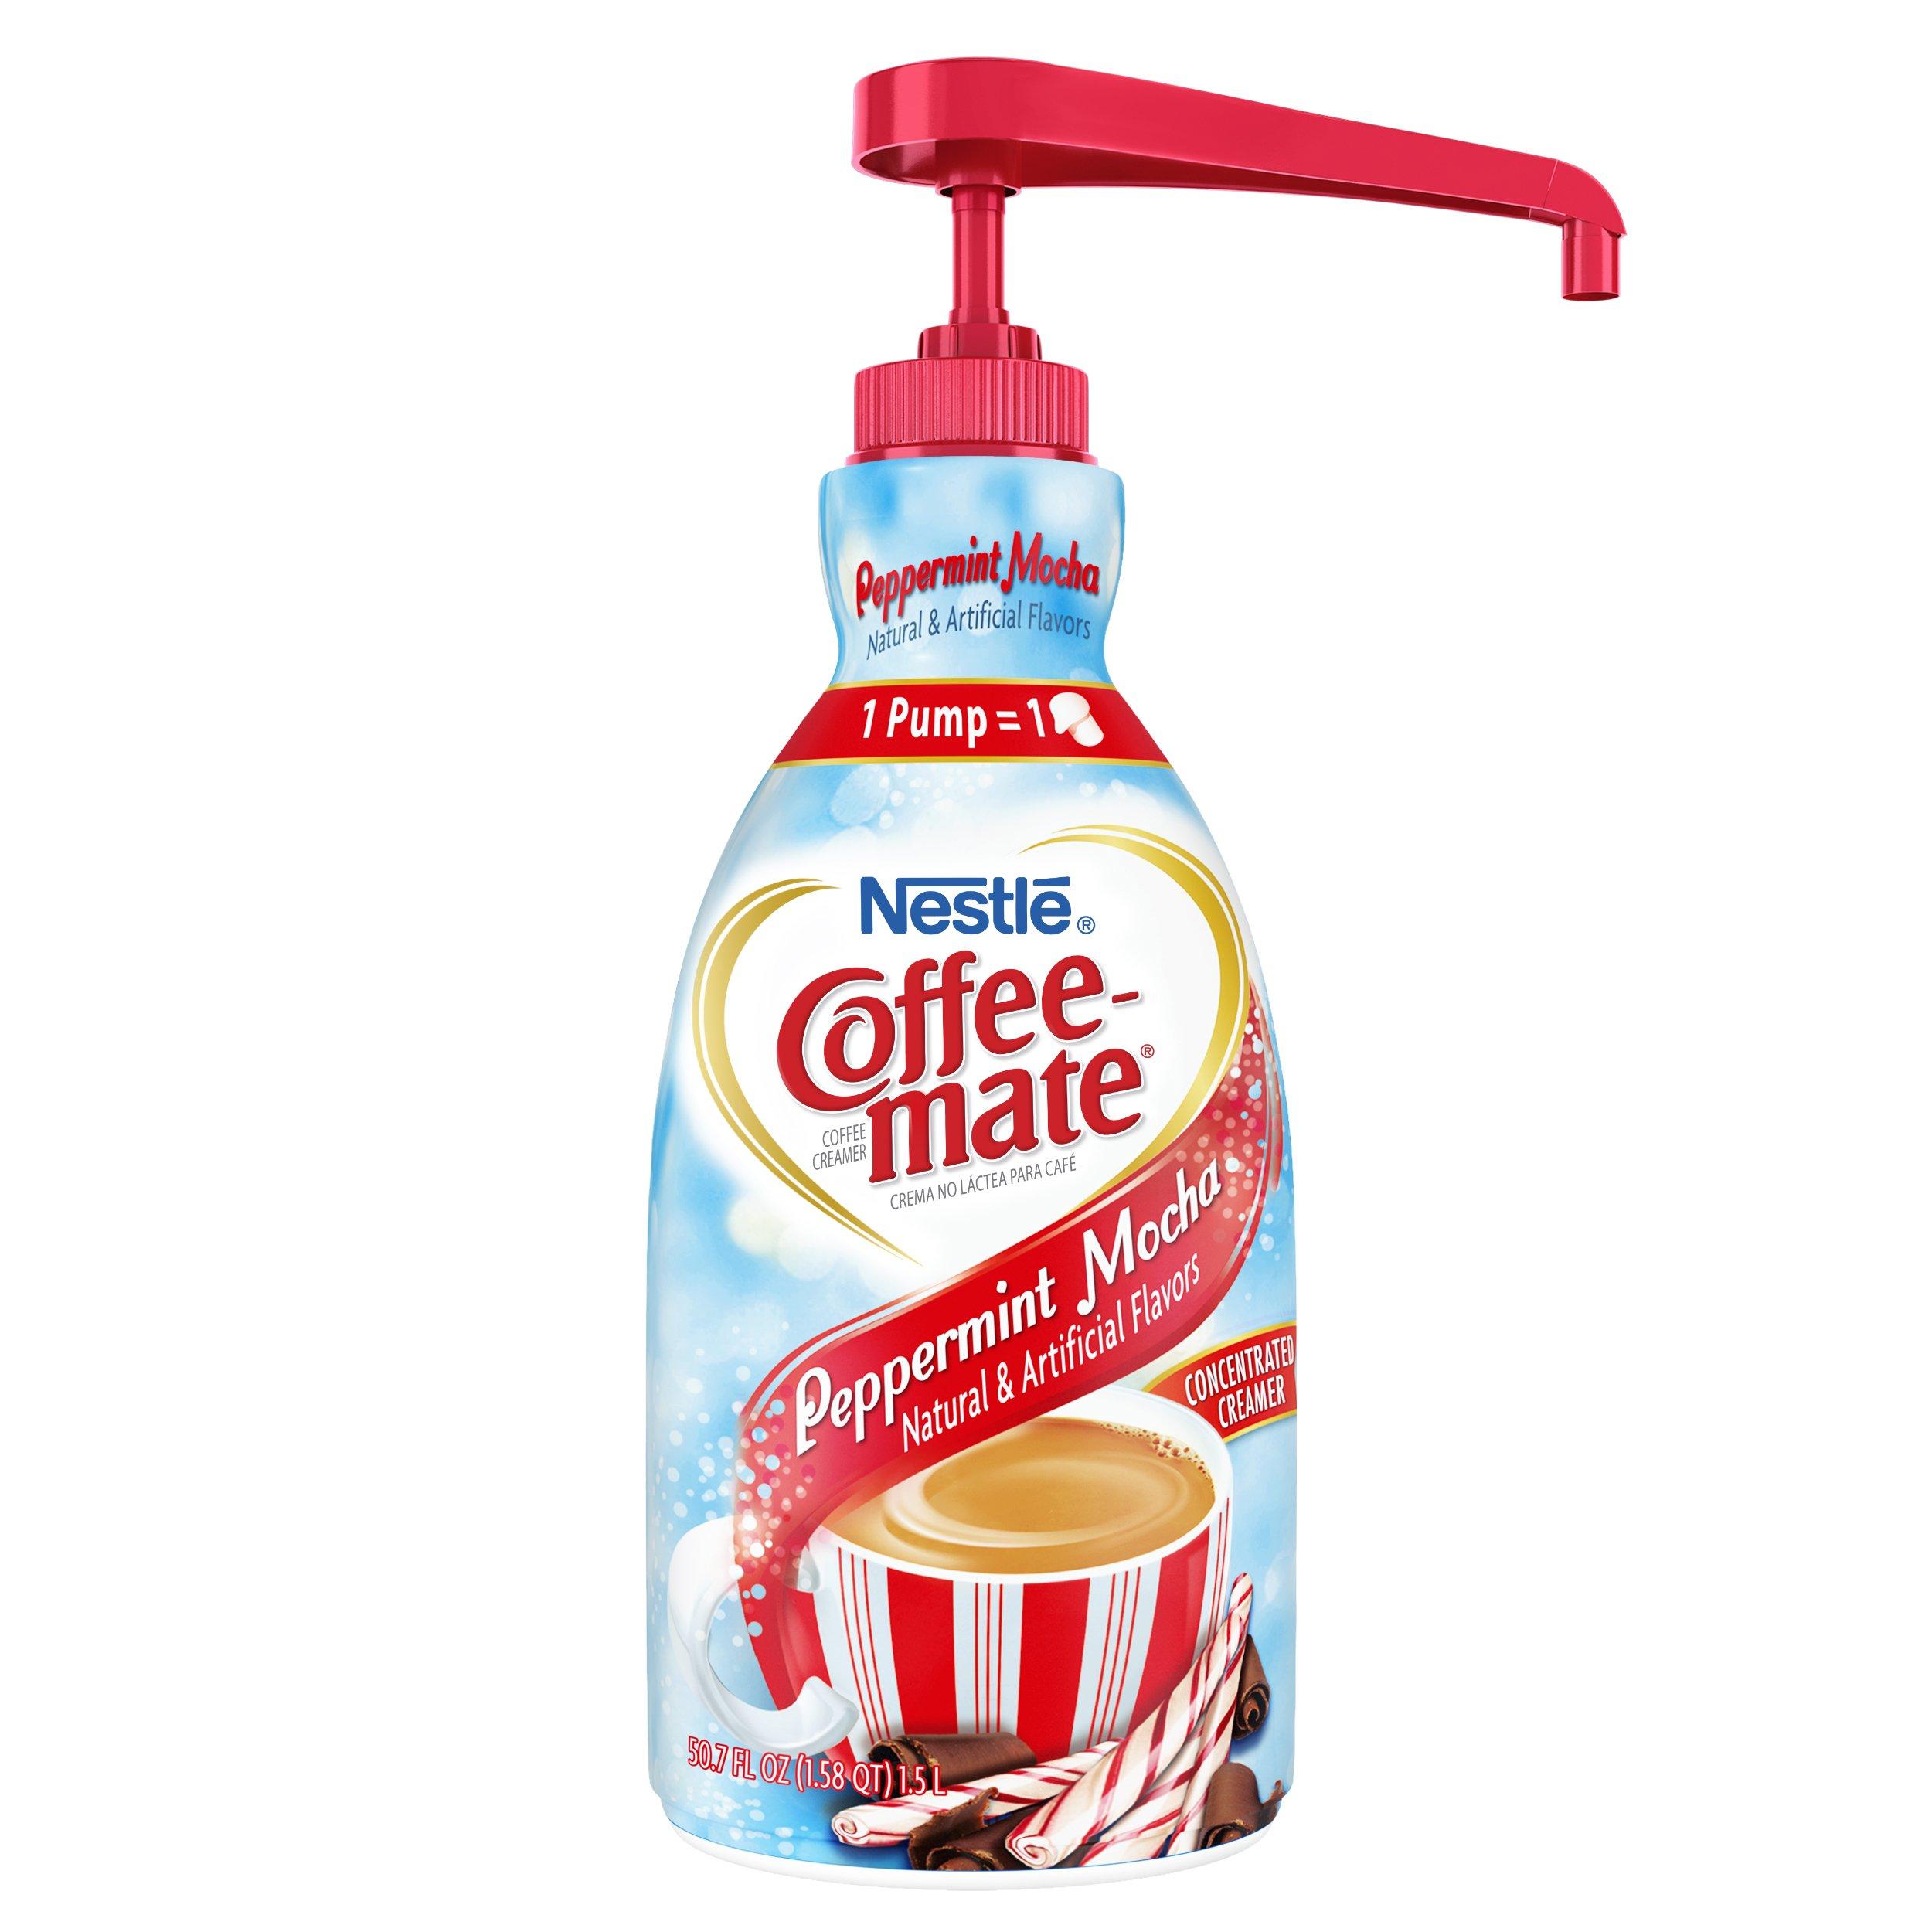 Nestle Coffee-mate Coffee Creamer, Peppermint Mocha, liquid pump bottle, 50.7 Fl. Oz (Pack of 1) by Nestle Coffee Mate